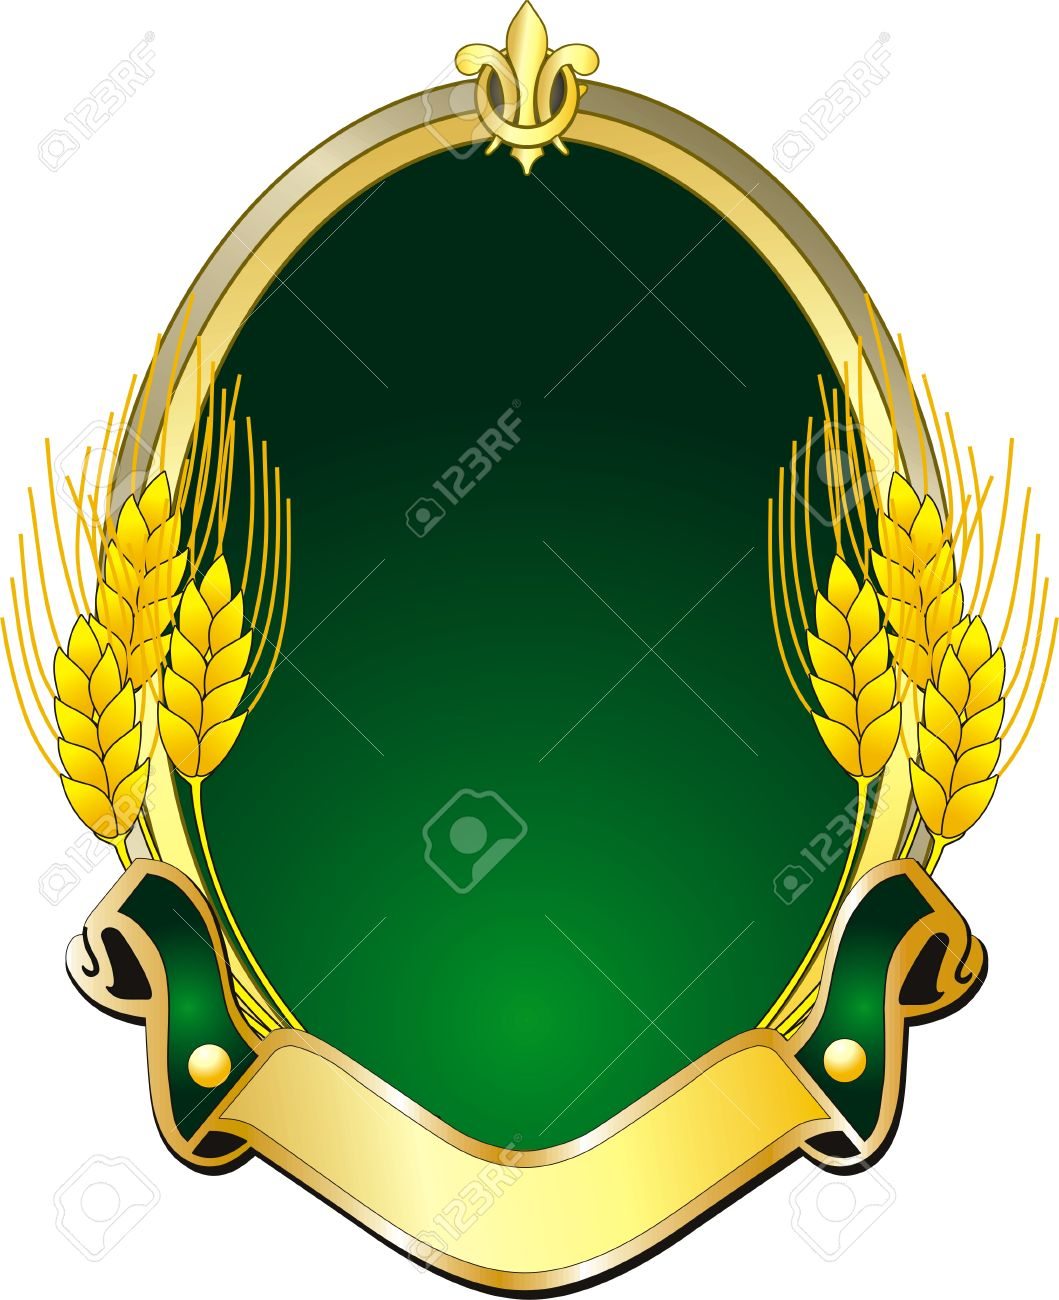 hight resolution of 1059x1300 grain clipart logo